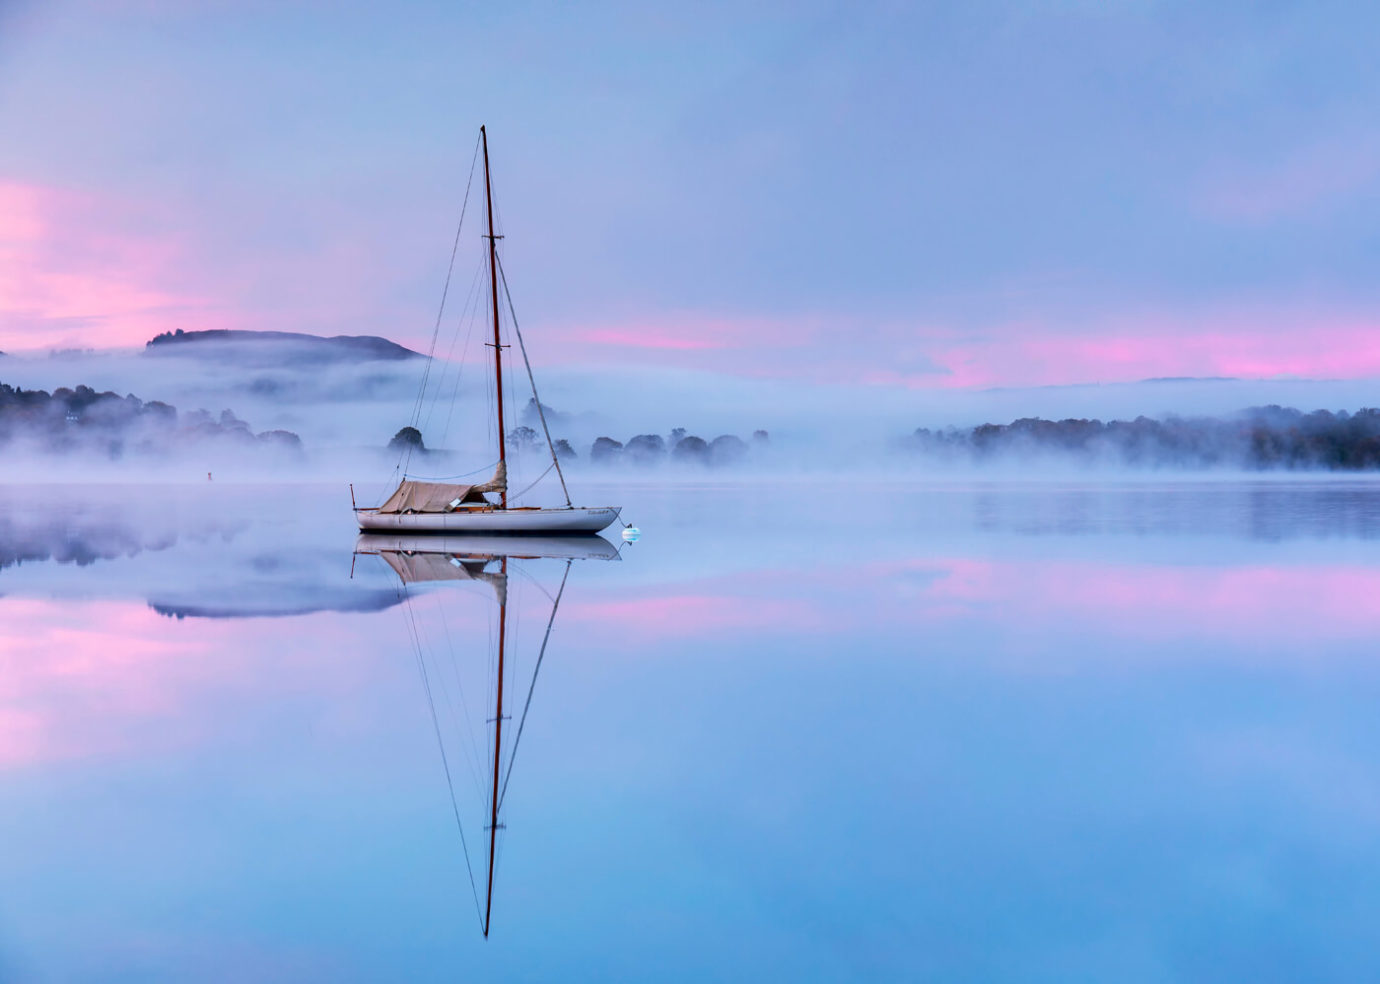 Sunrise, Windermere, Lake District